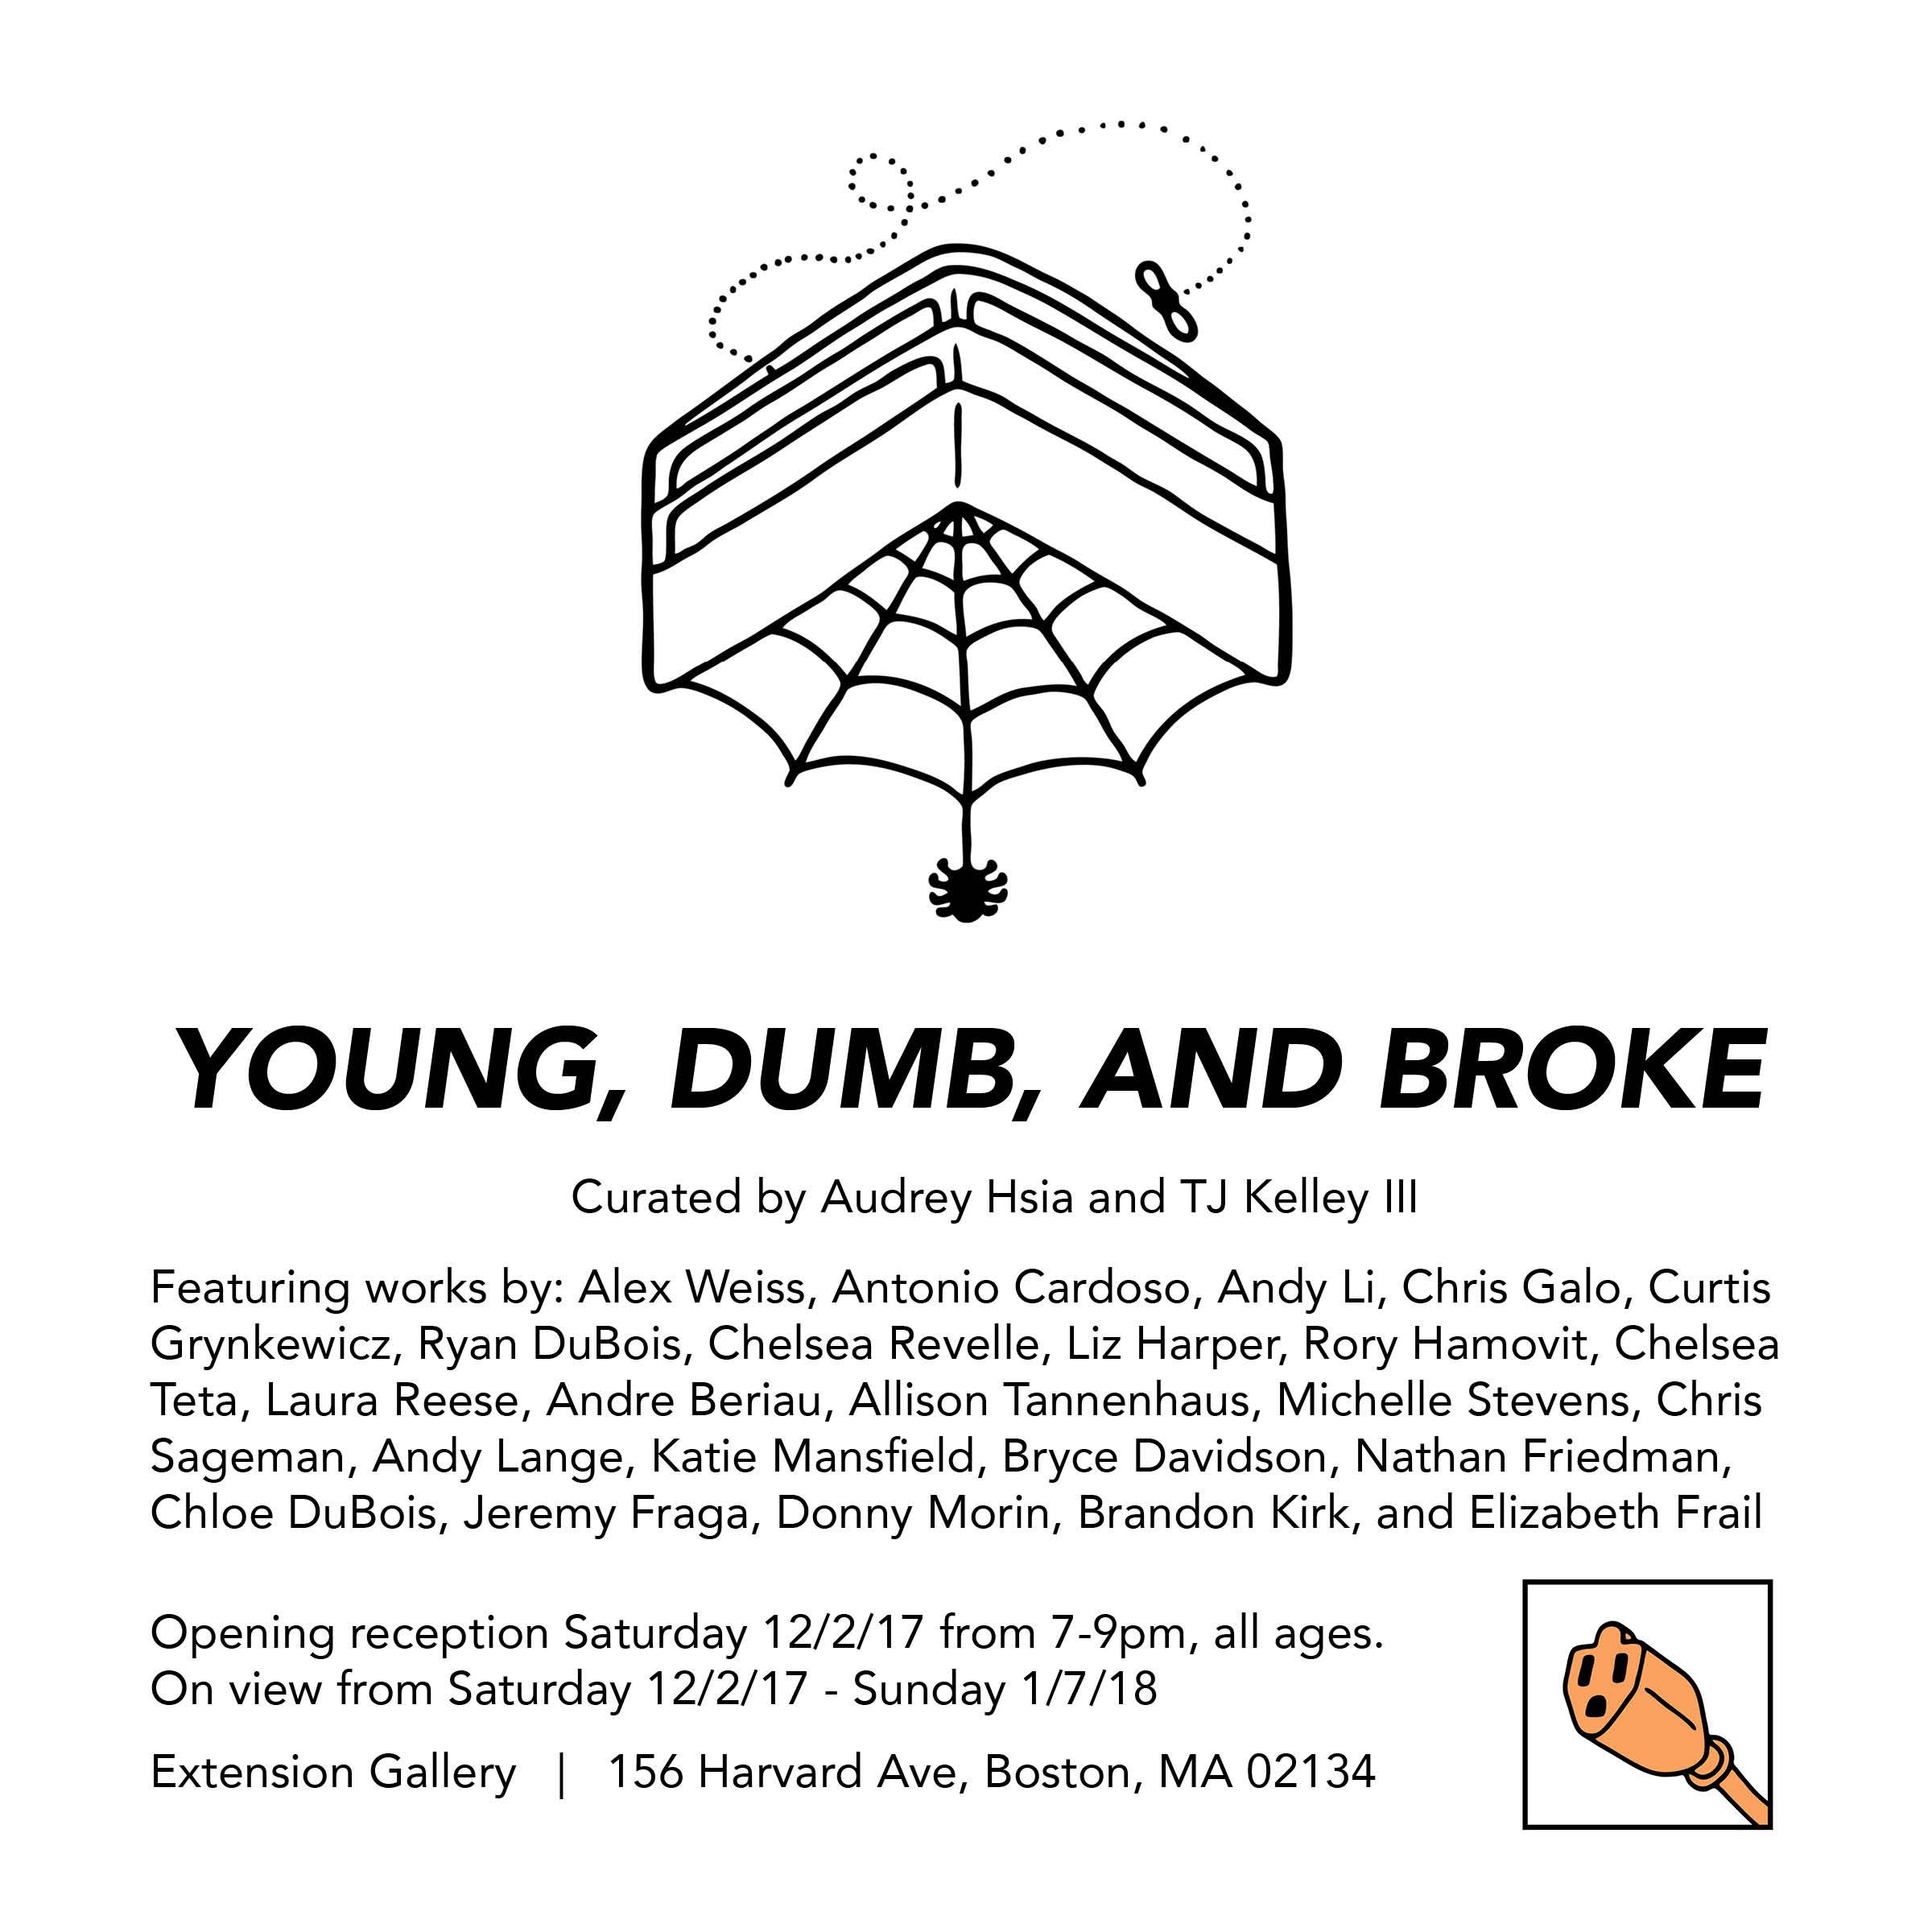 YoungDumbBroke_Flier.jpg